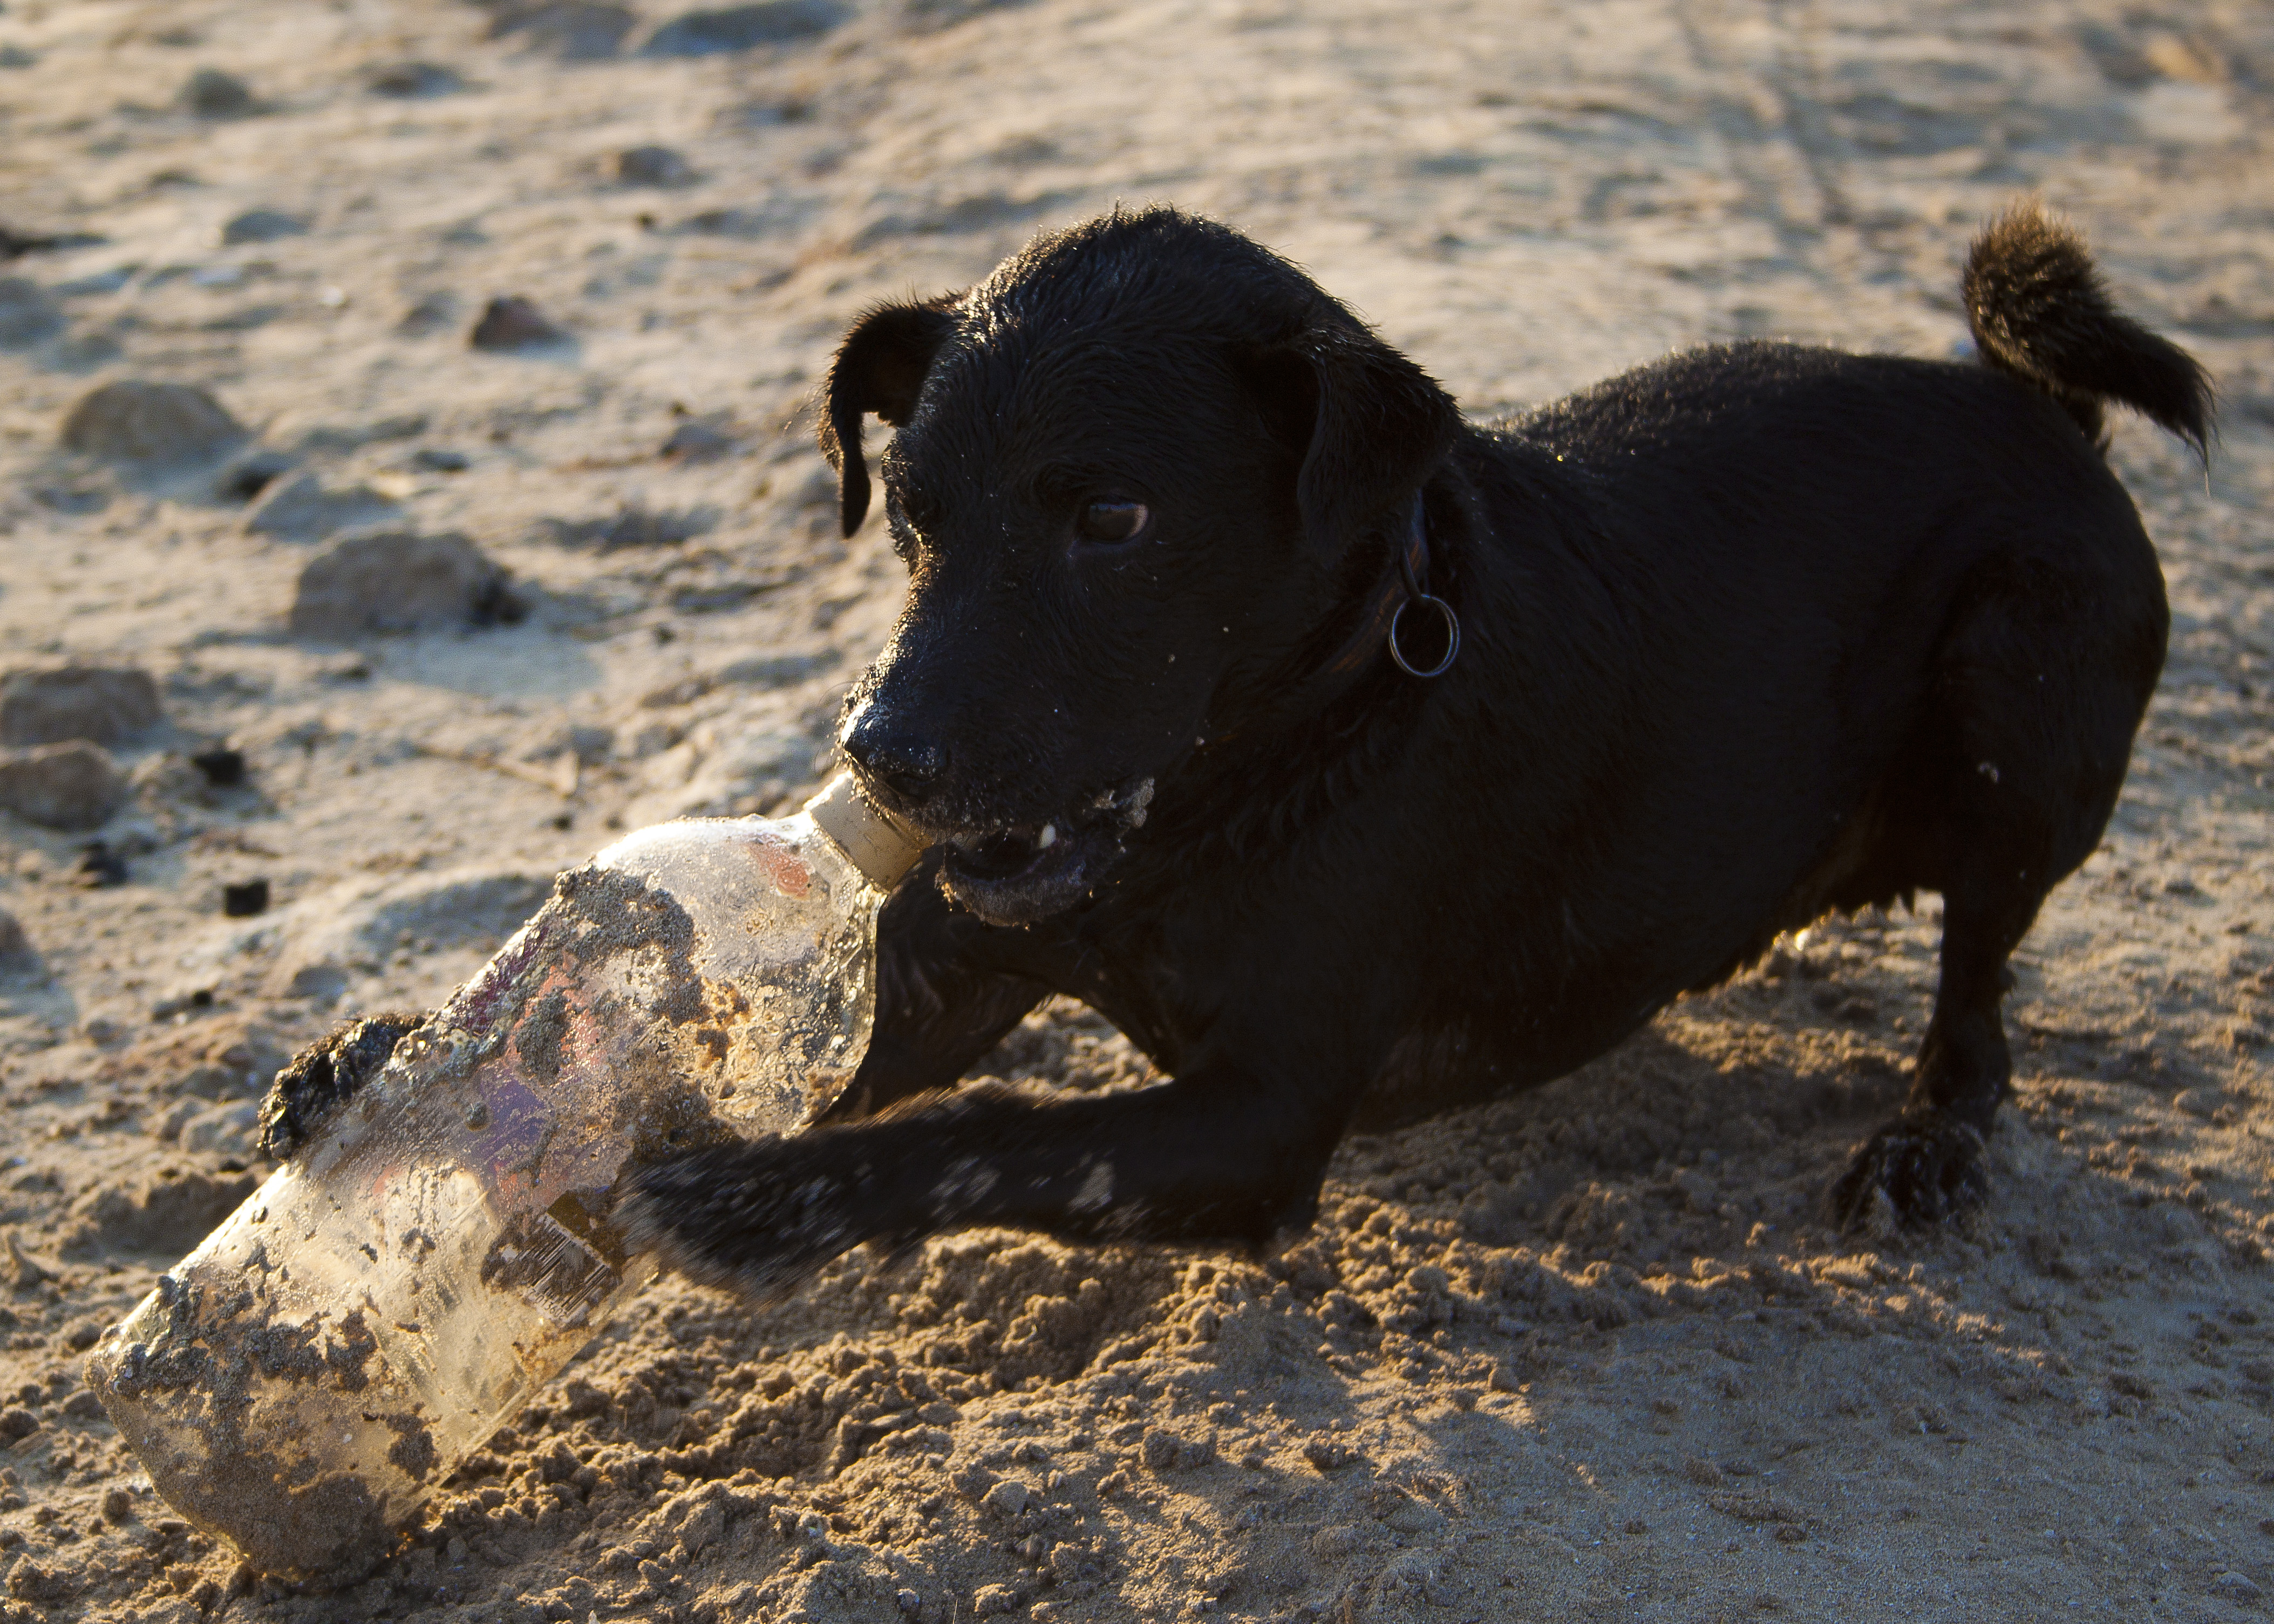 Drinkdog by Drinkdog